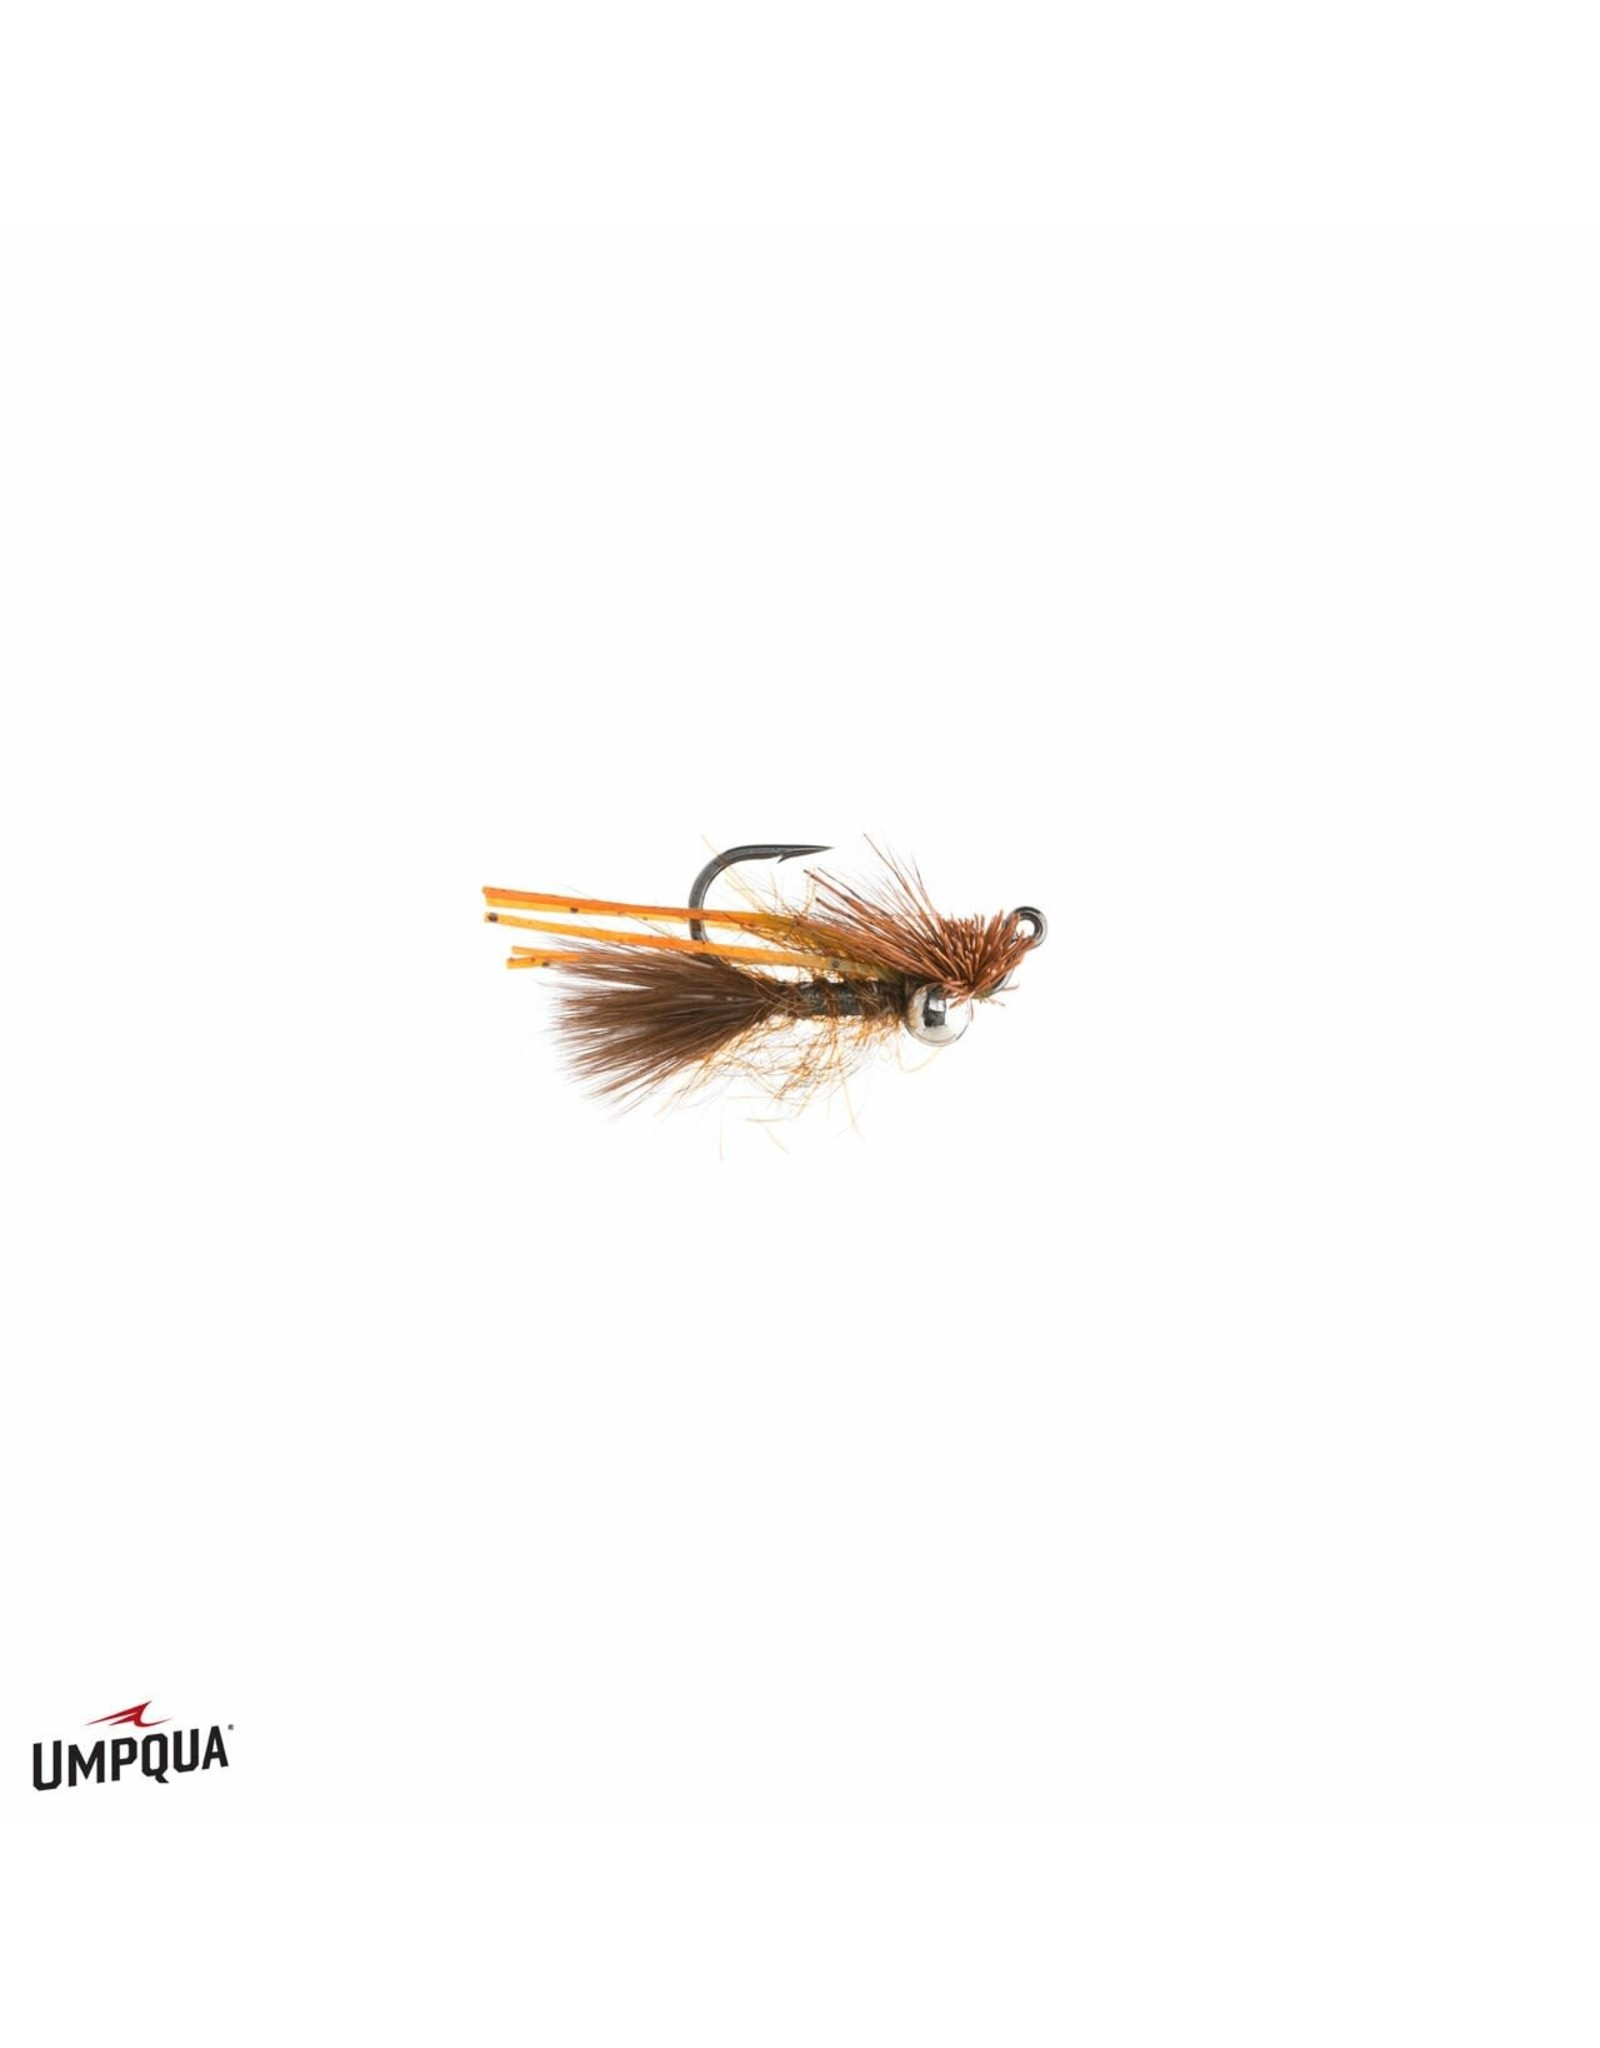 Umpqua Great Carpholio Jigged Brown  #4